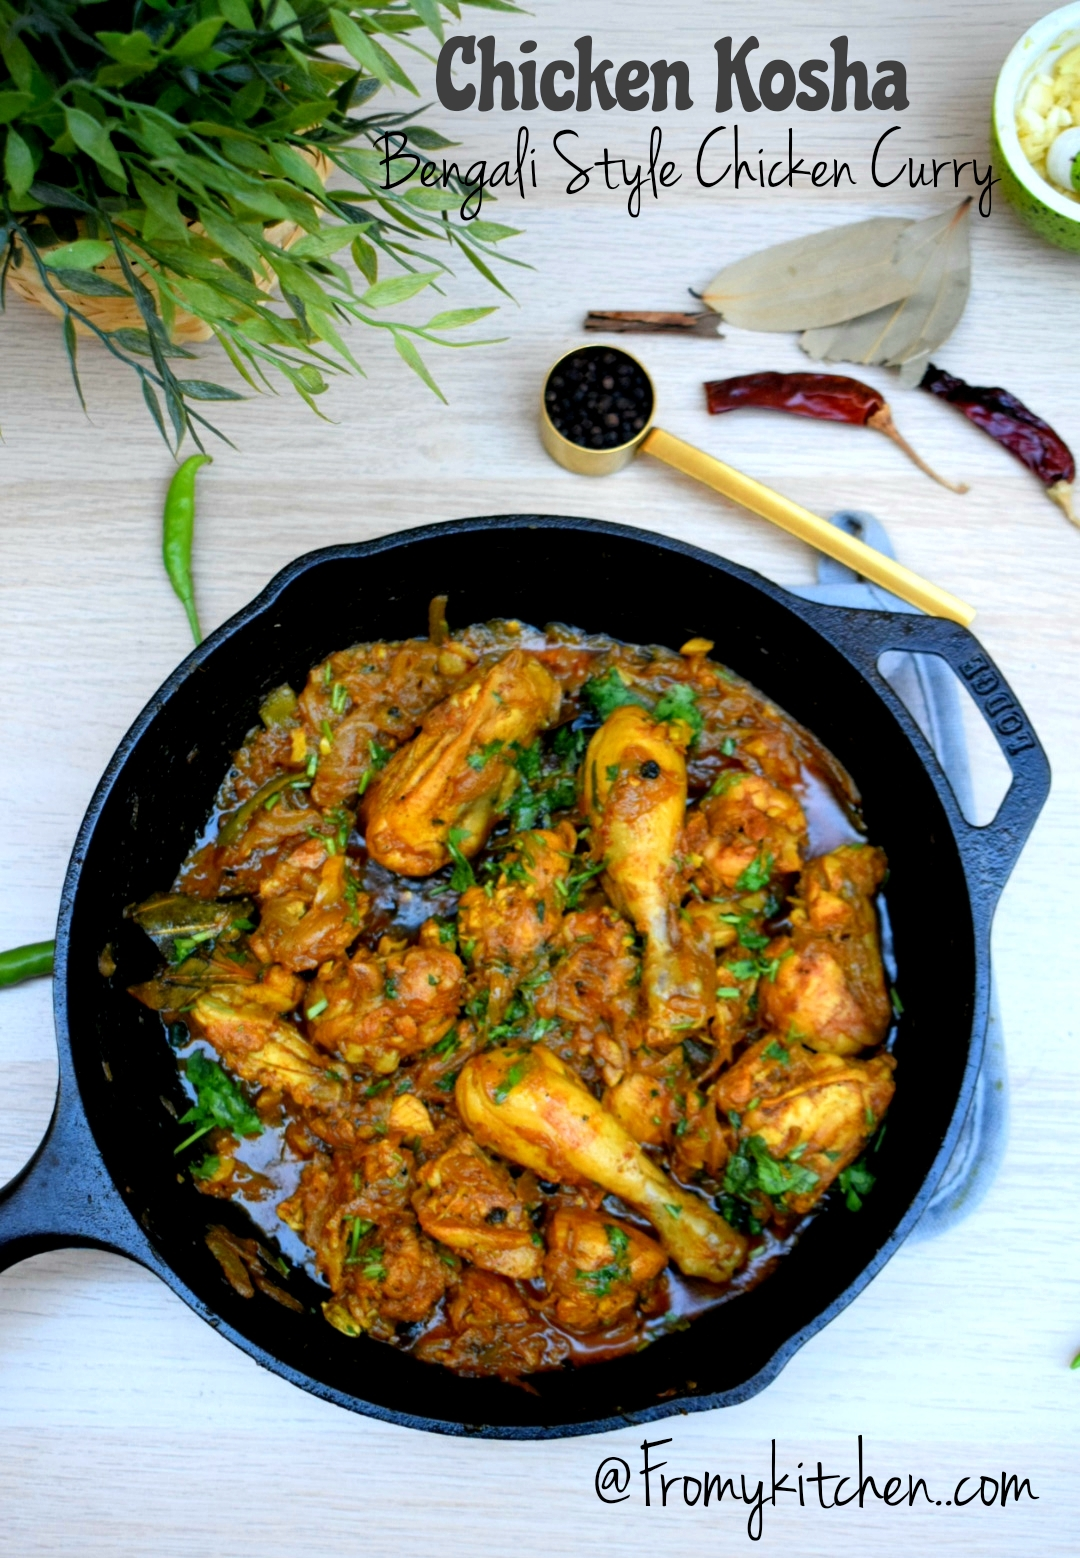 Chicken Kosha